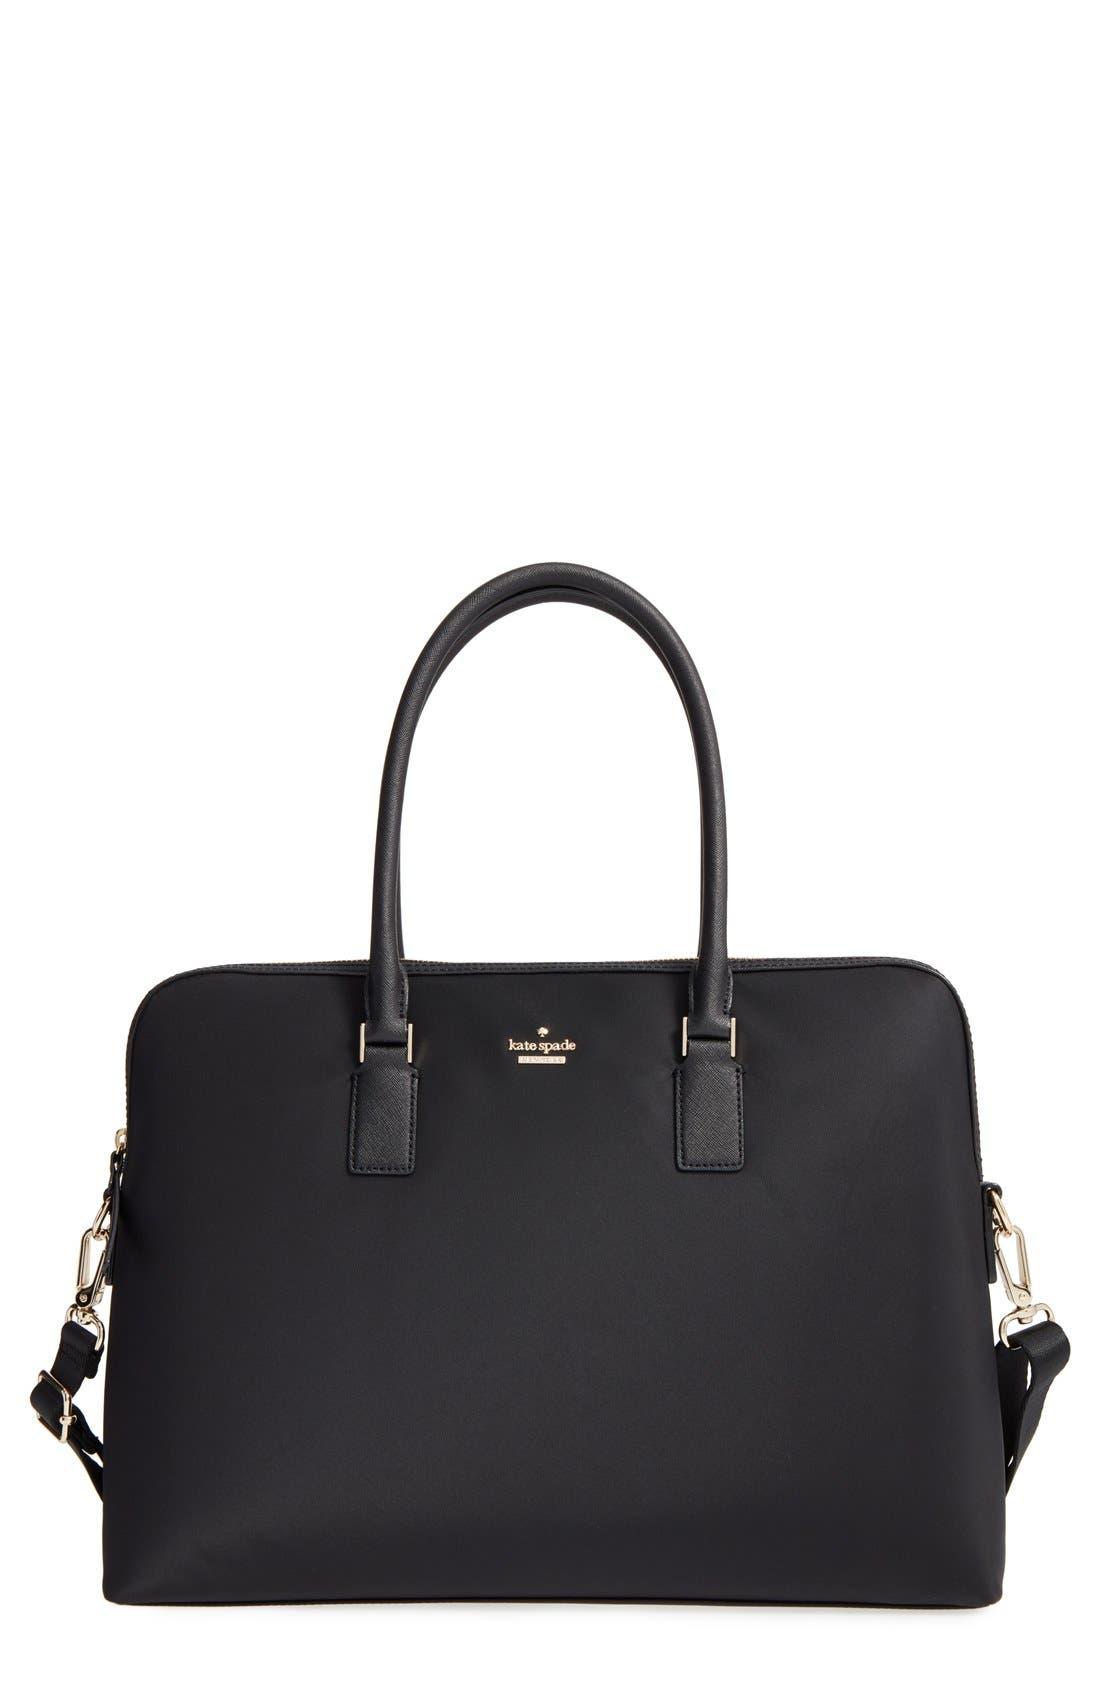 kate spade new york daveney 15 inch laptop bag